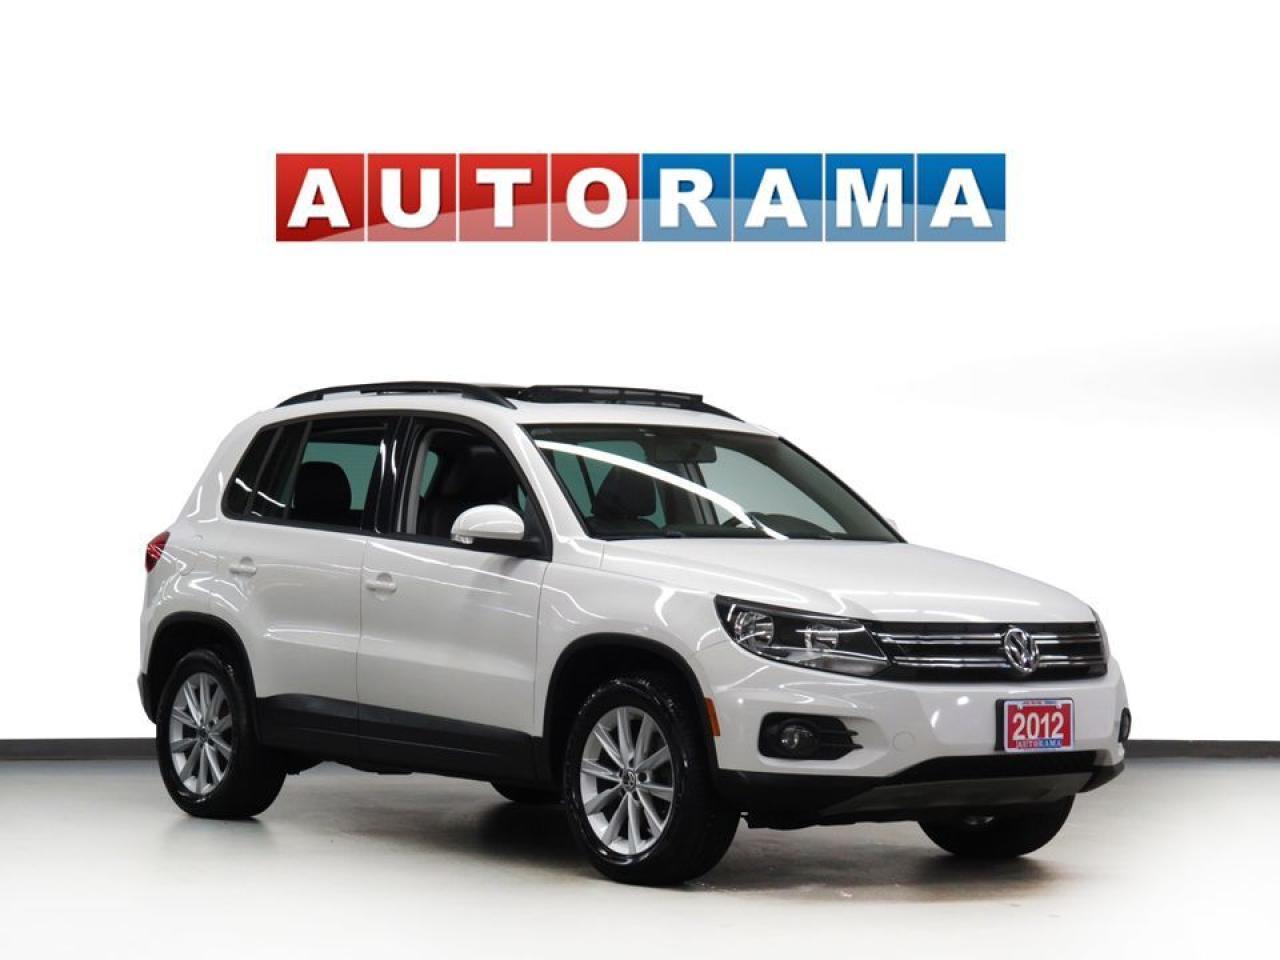 2012 Volkswagen Tiguan 2.0 TSI LEATHER SUNROOF AWD